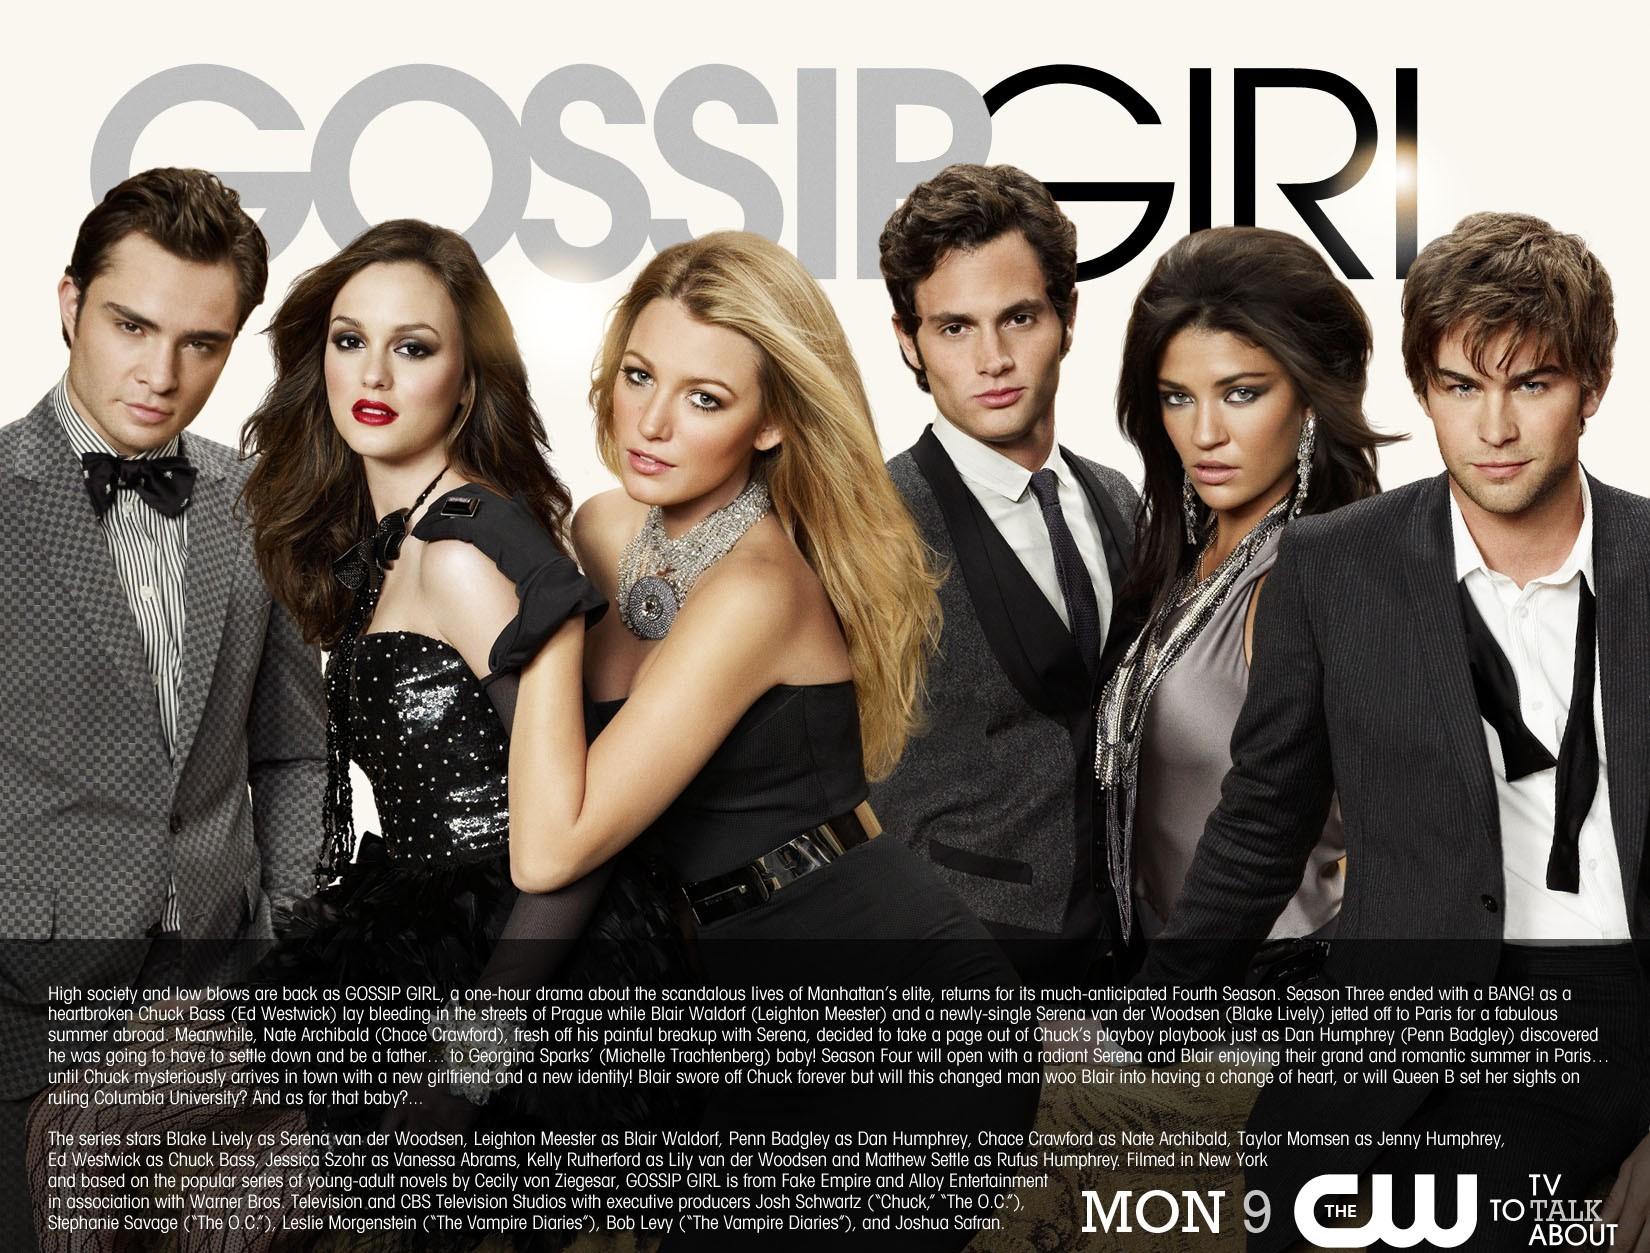 http://seriesaddict.fr/images/galerie/Gossip-Girl/posterSaison-4/gossip-girl-poster-saison3-upfront.jpg